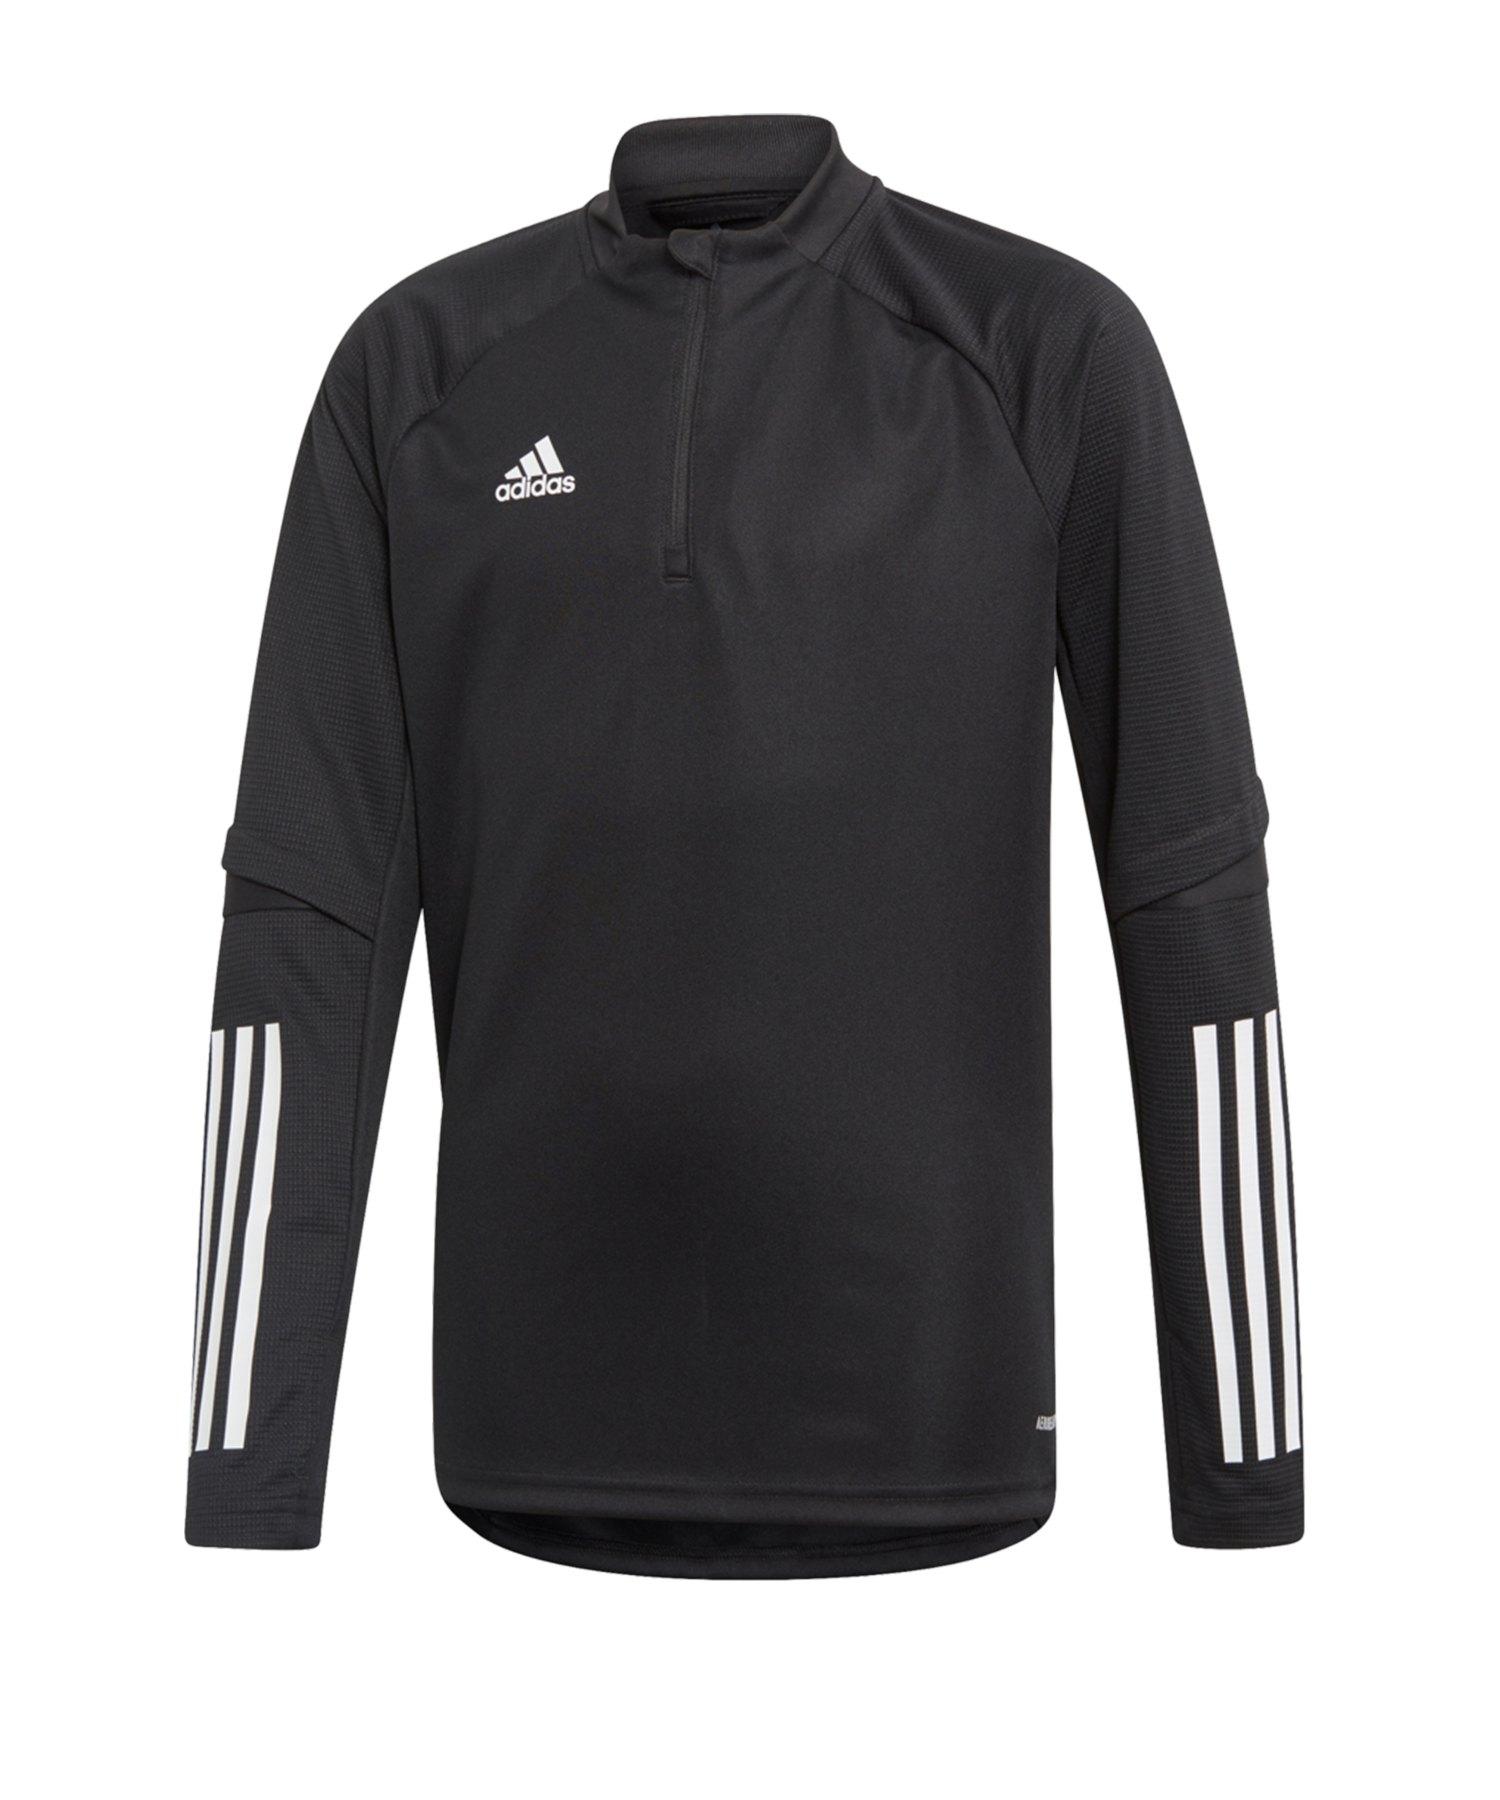 adidas Condivo 20 Trainingstop Kids Schwarz - schwarz